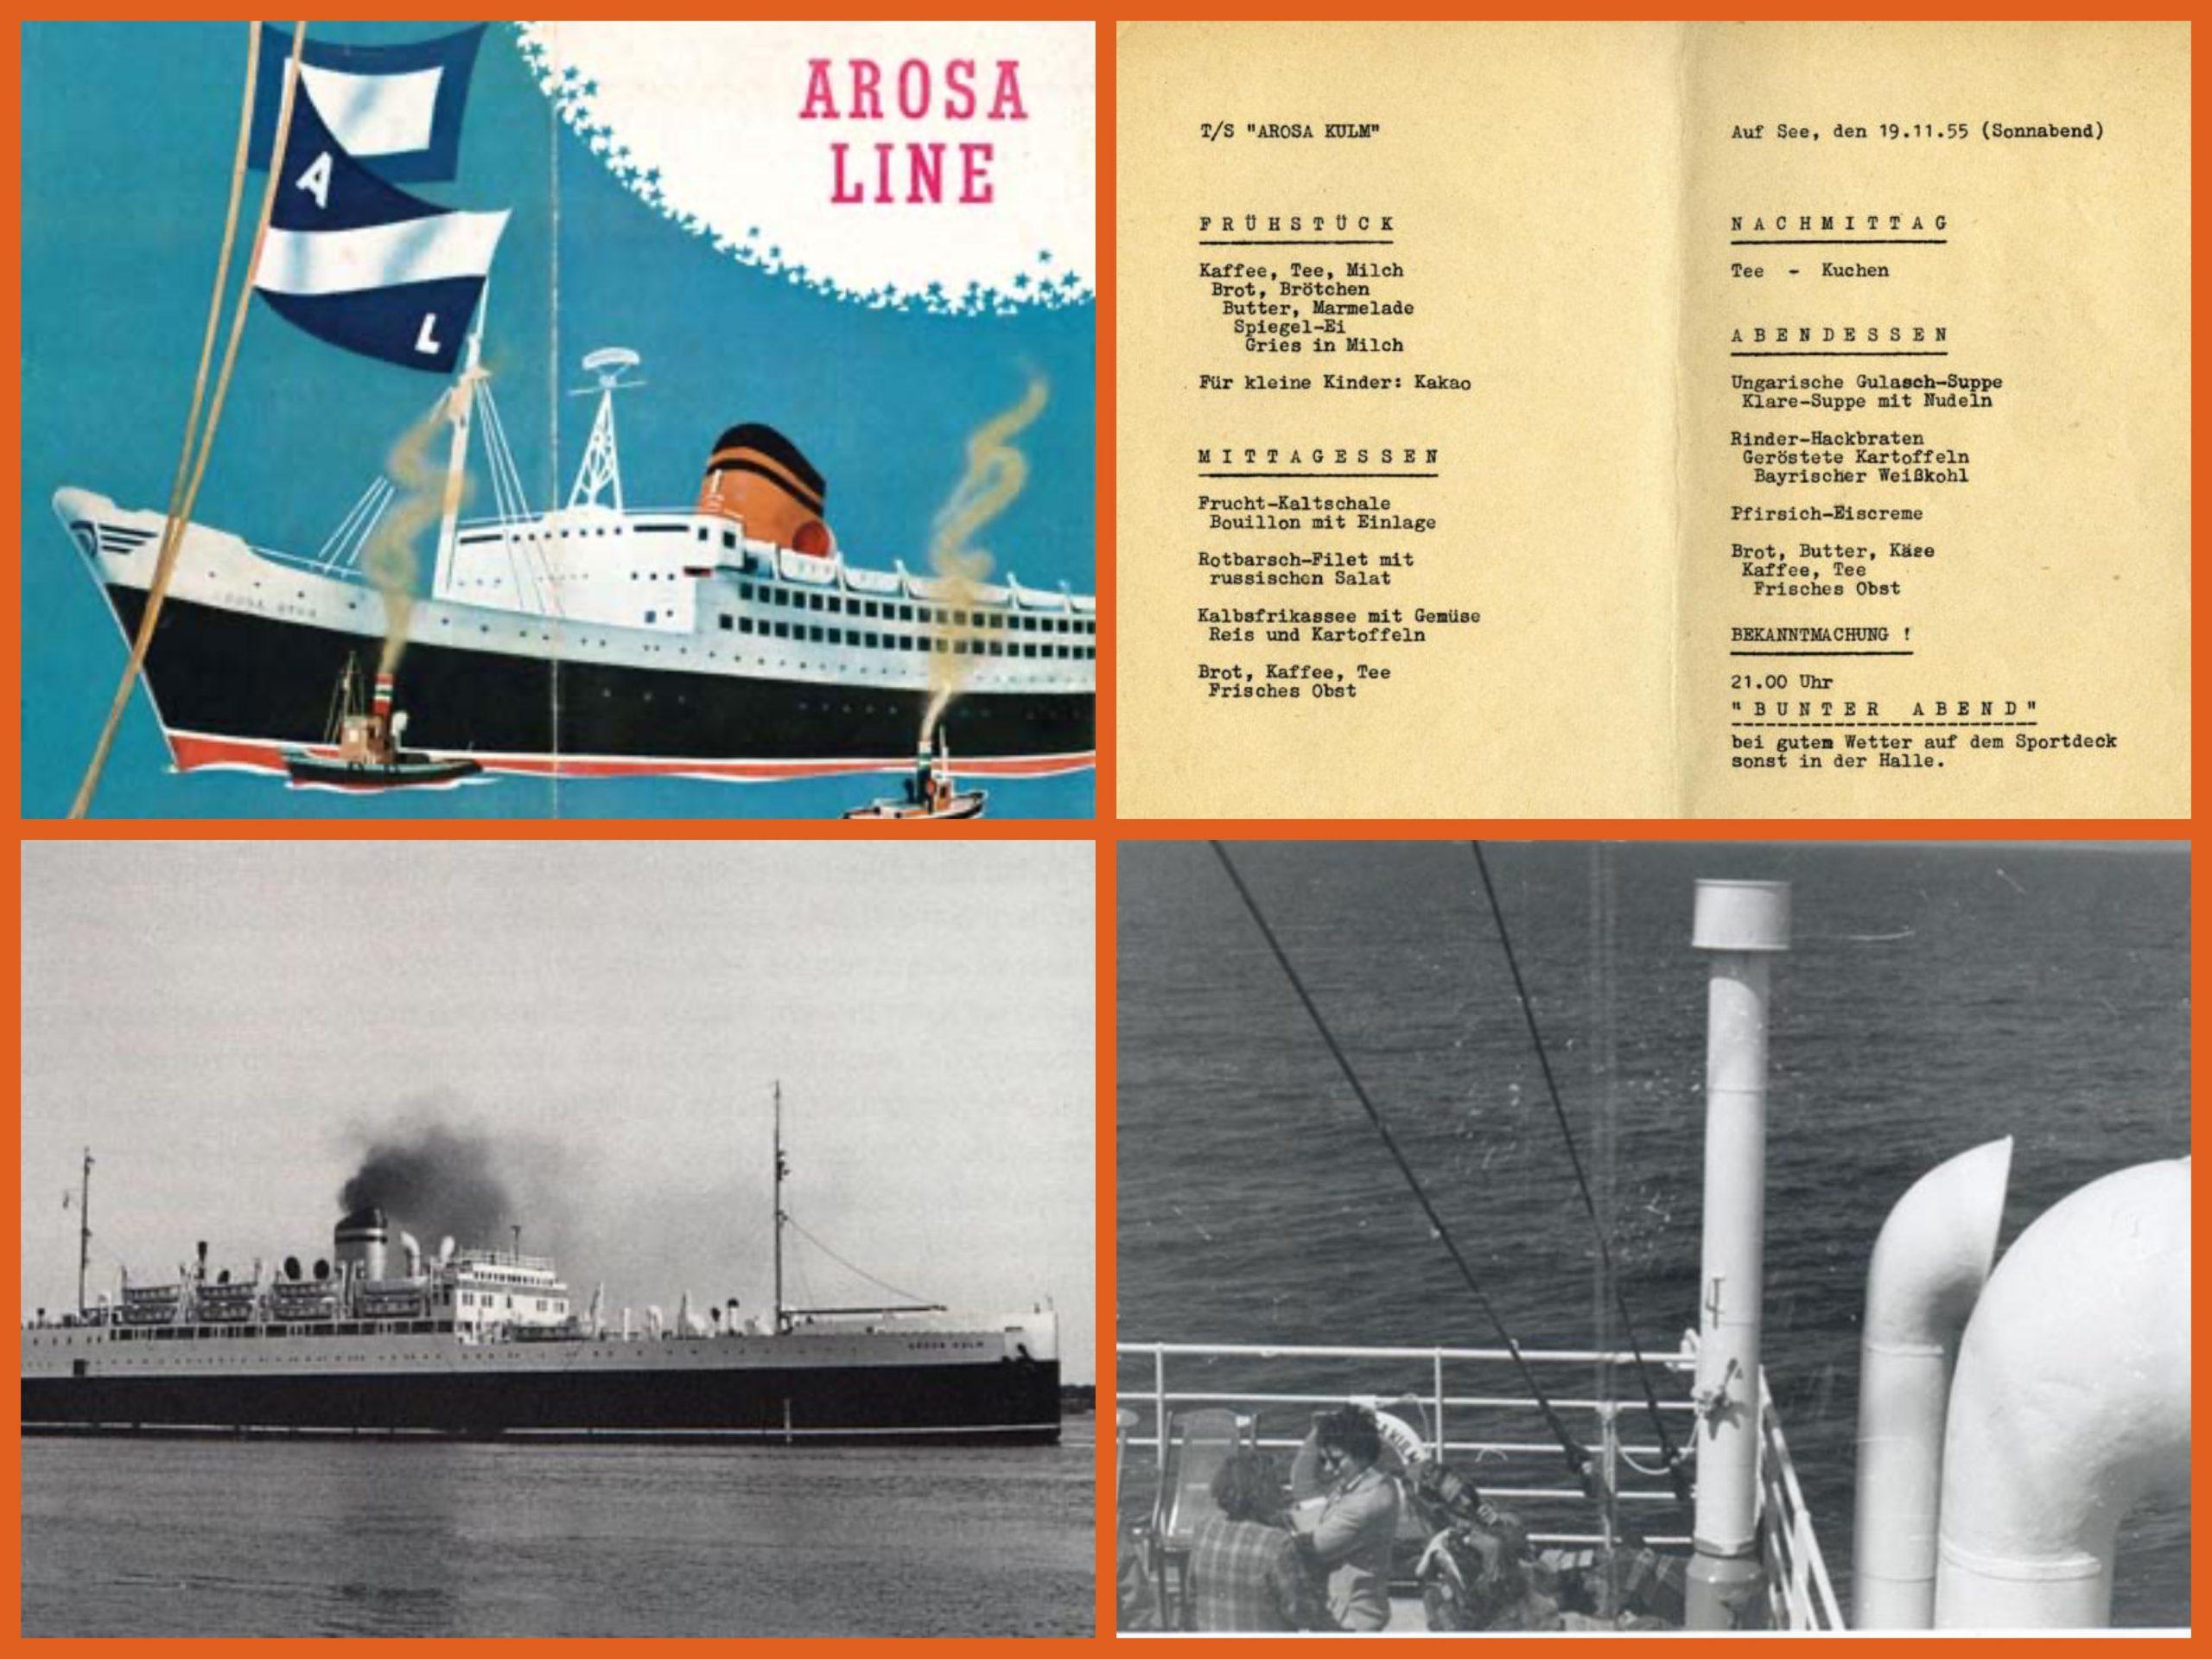 AROSA LINE, STEAMSHIPS, IMMIGRANTS, STUDENTS, 1950S, PASSENGERS SHIPS, CRUISE SHIPS